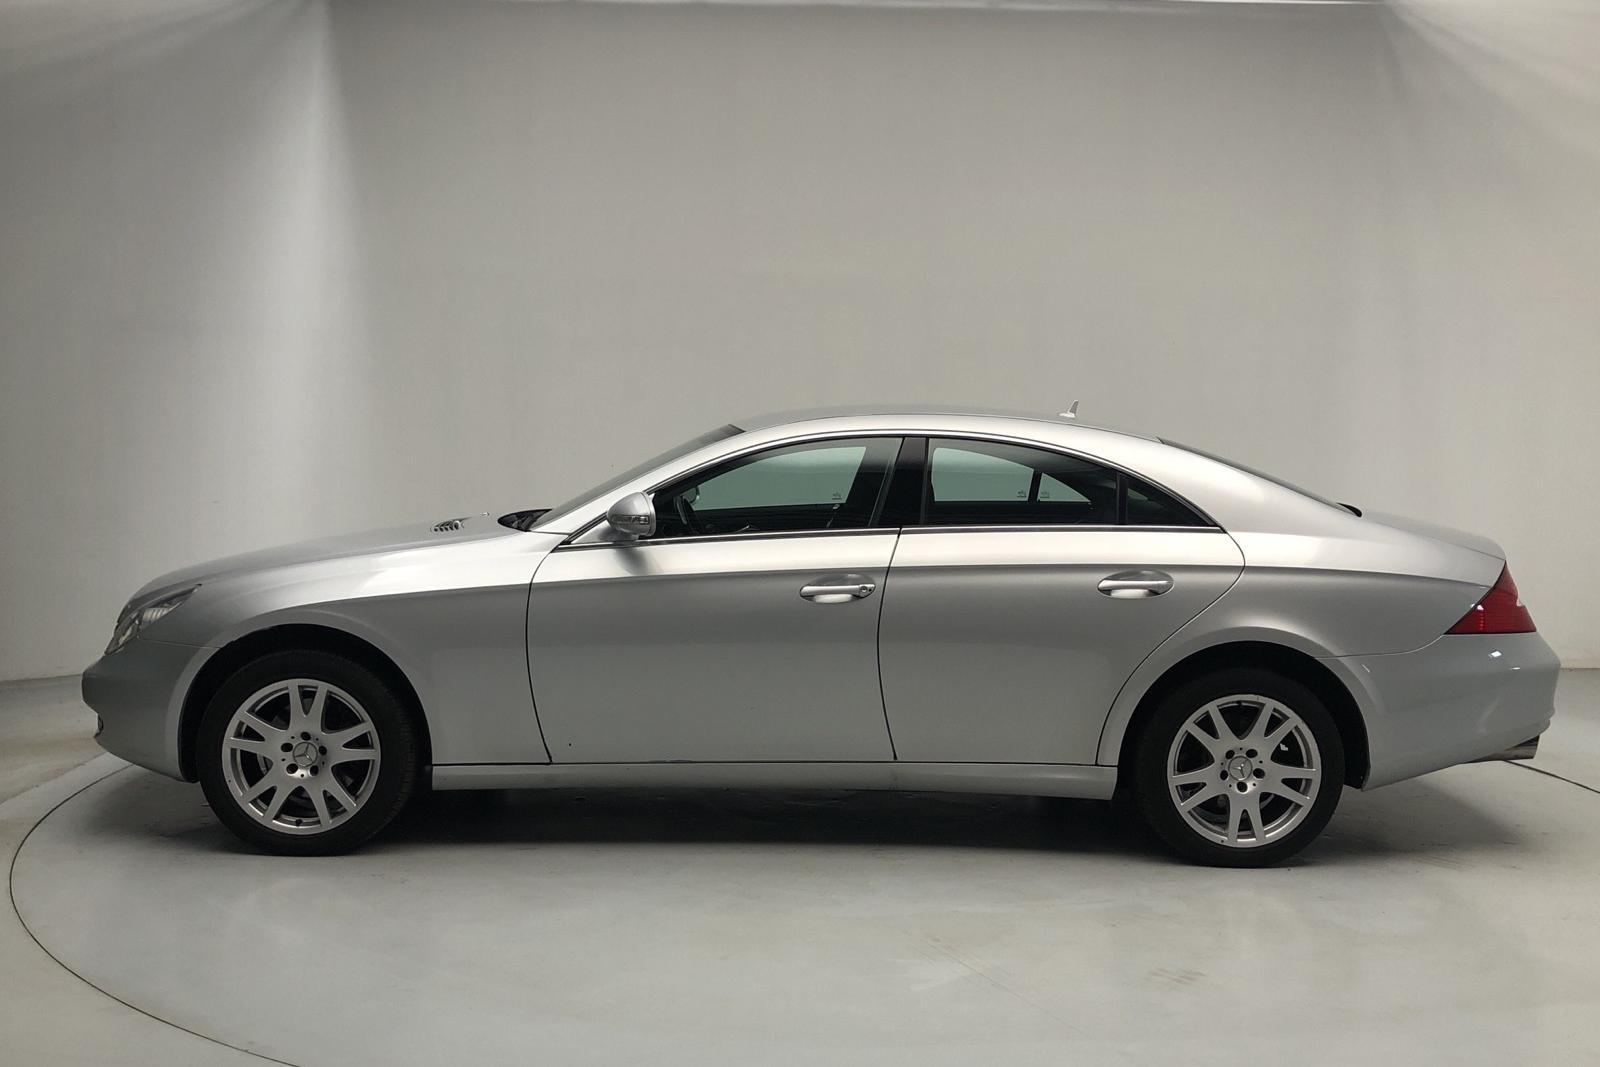 Mercedes CLS 320 CDI (224hk) - 143 000 km - Automatic - silver - 2007